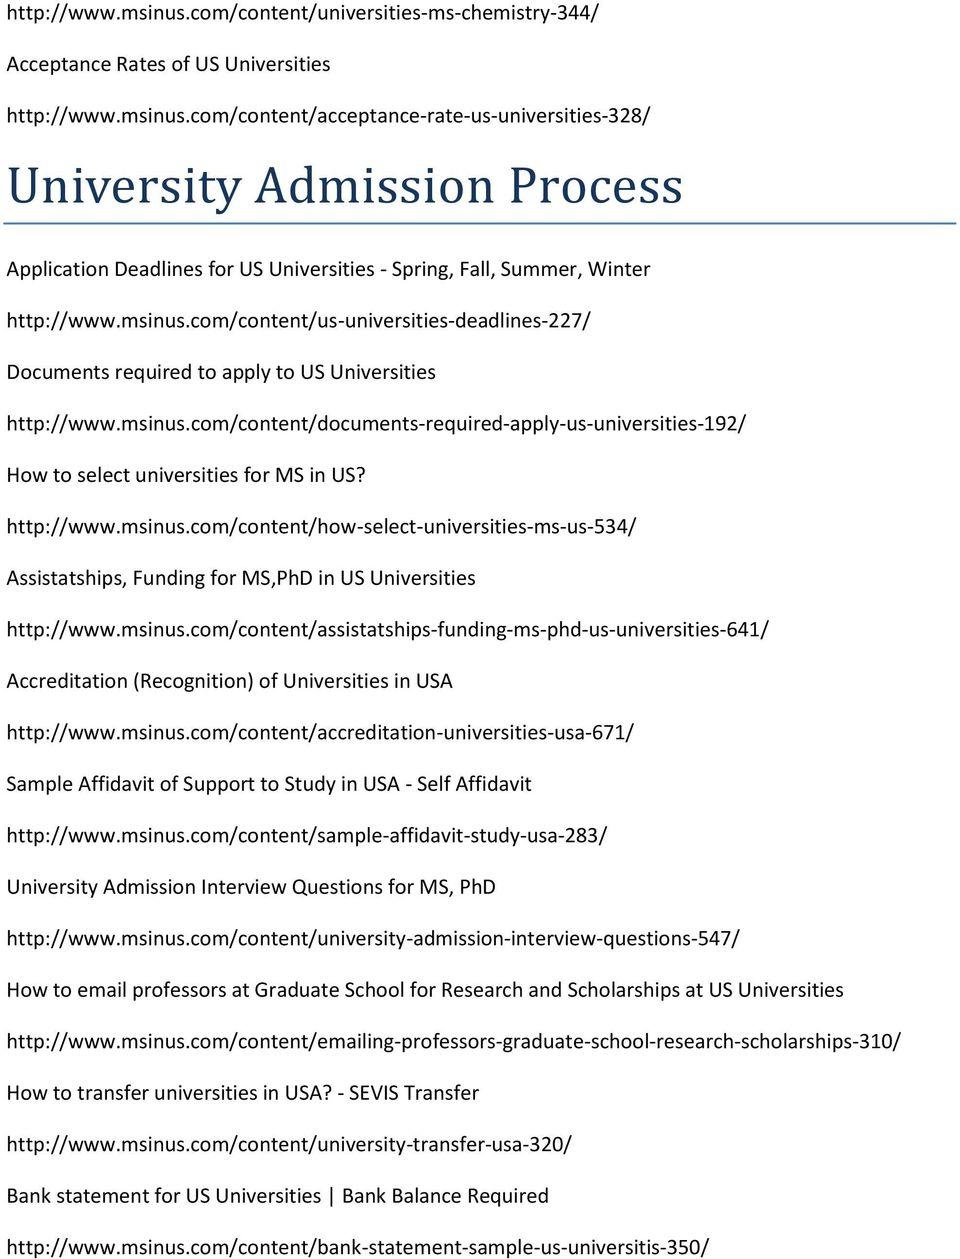 hight resolution of MSinUS.com s E-book Complete Guide to MSinUS Author: Ajay Cherukuri. GRE  Preparation \u0026 Universities - PDF Free Download